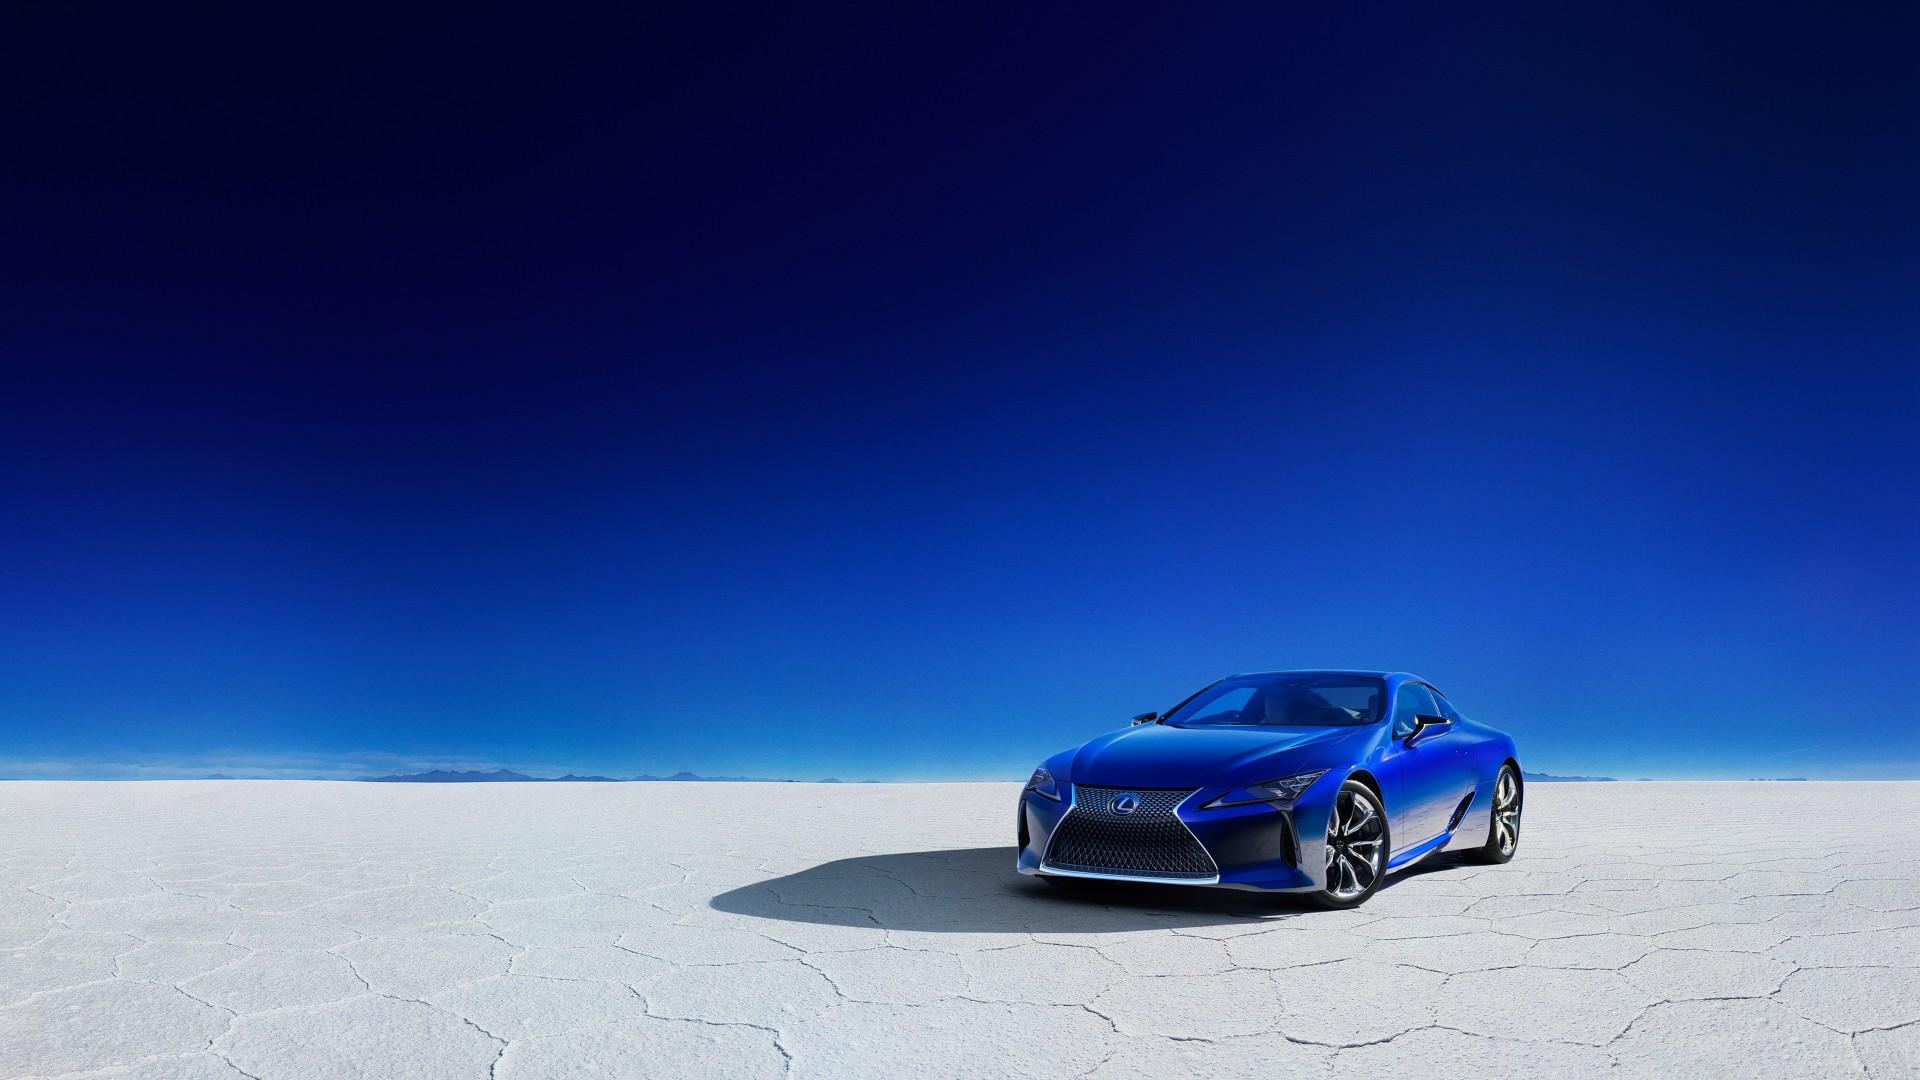 2018 Lexus LC 500h Structural Blue 4K Wallpaper HD Car